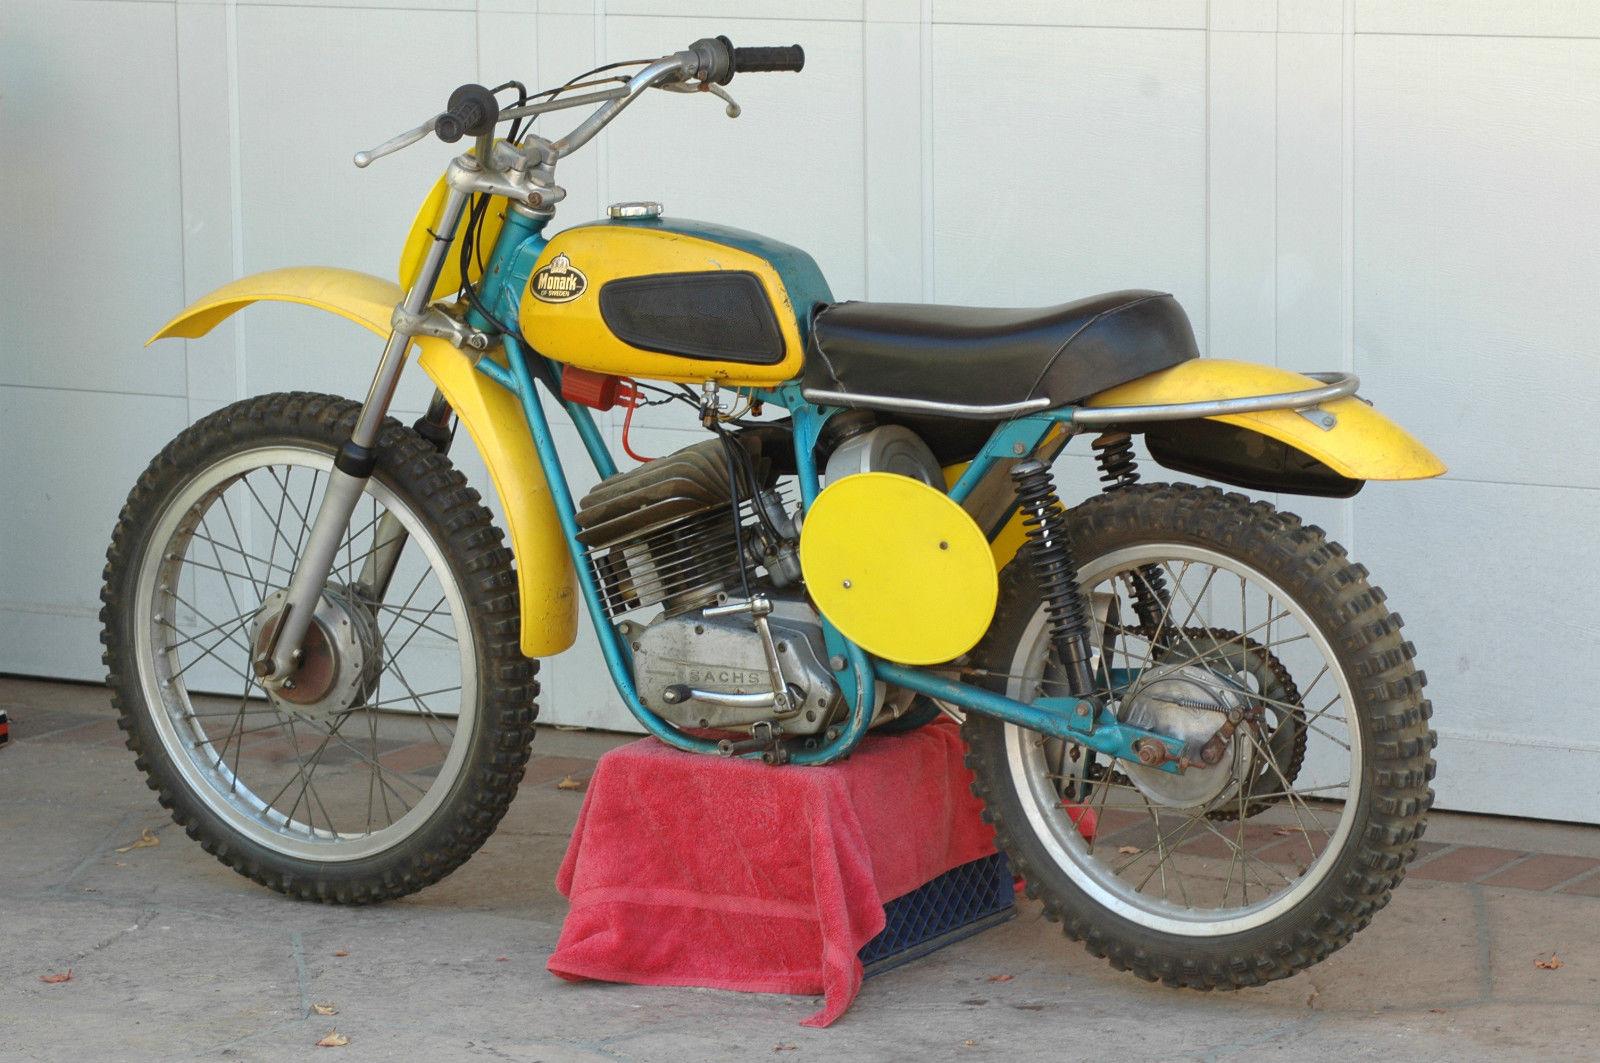 1973 monark 125 mx enduro vintage motocross. Black Bedroom Furniture Sets. Home Design Ideas